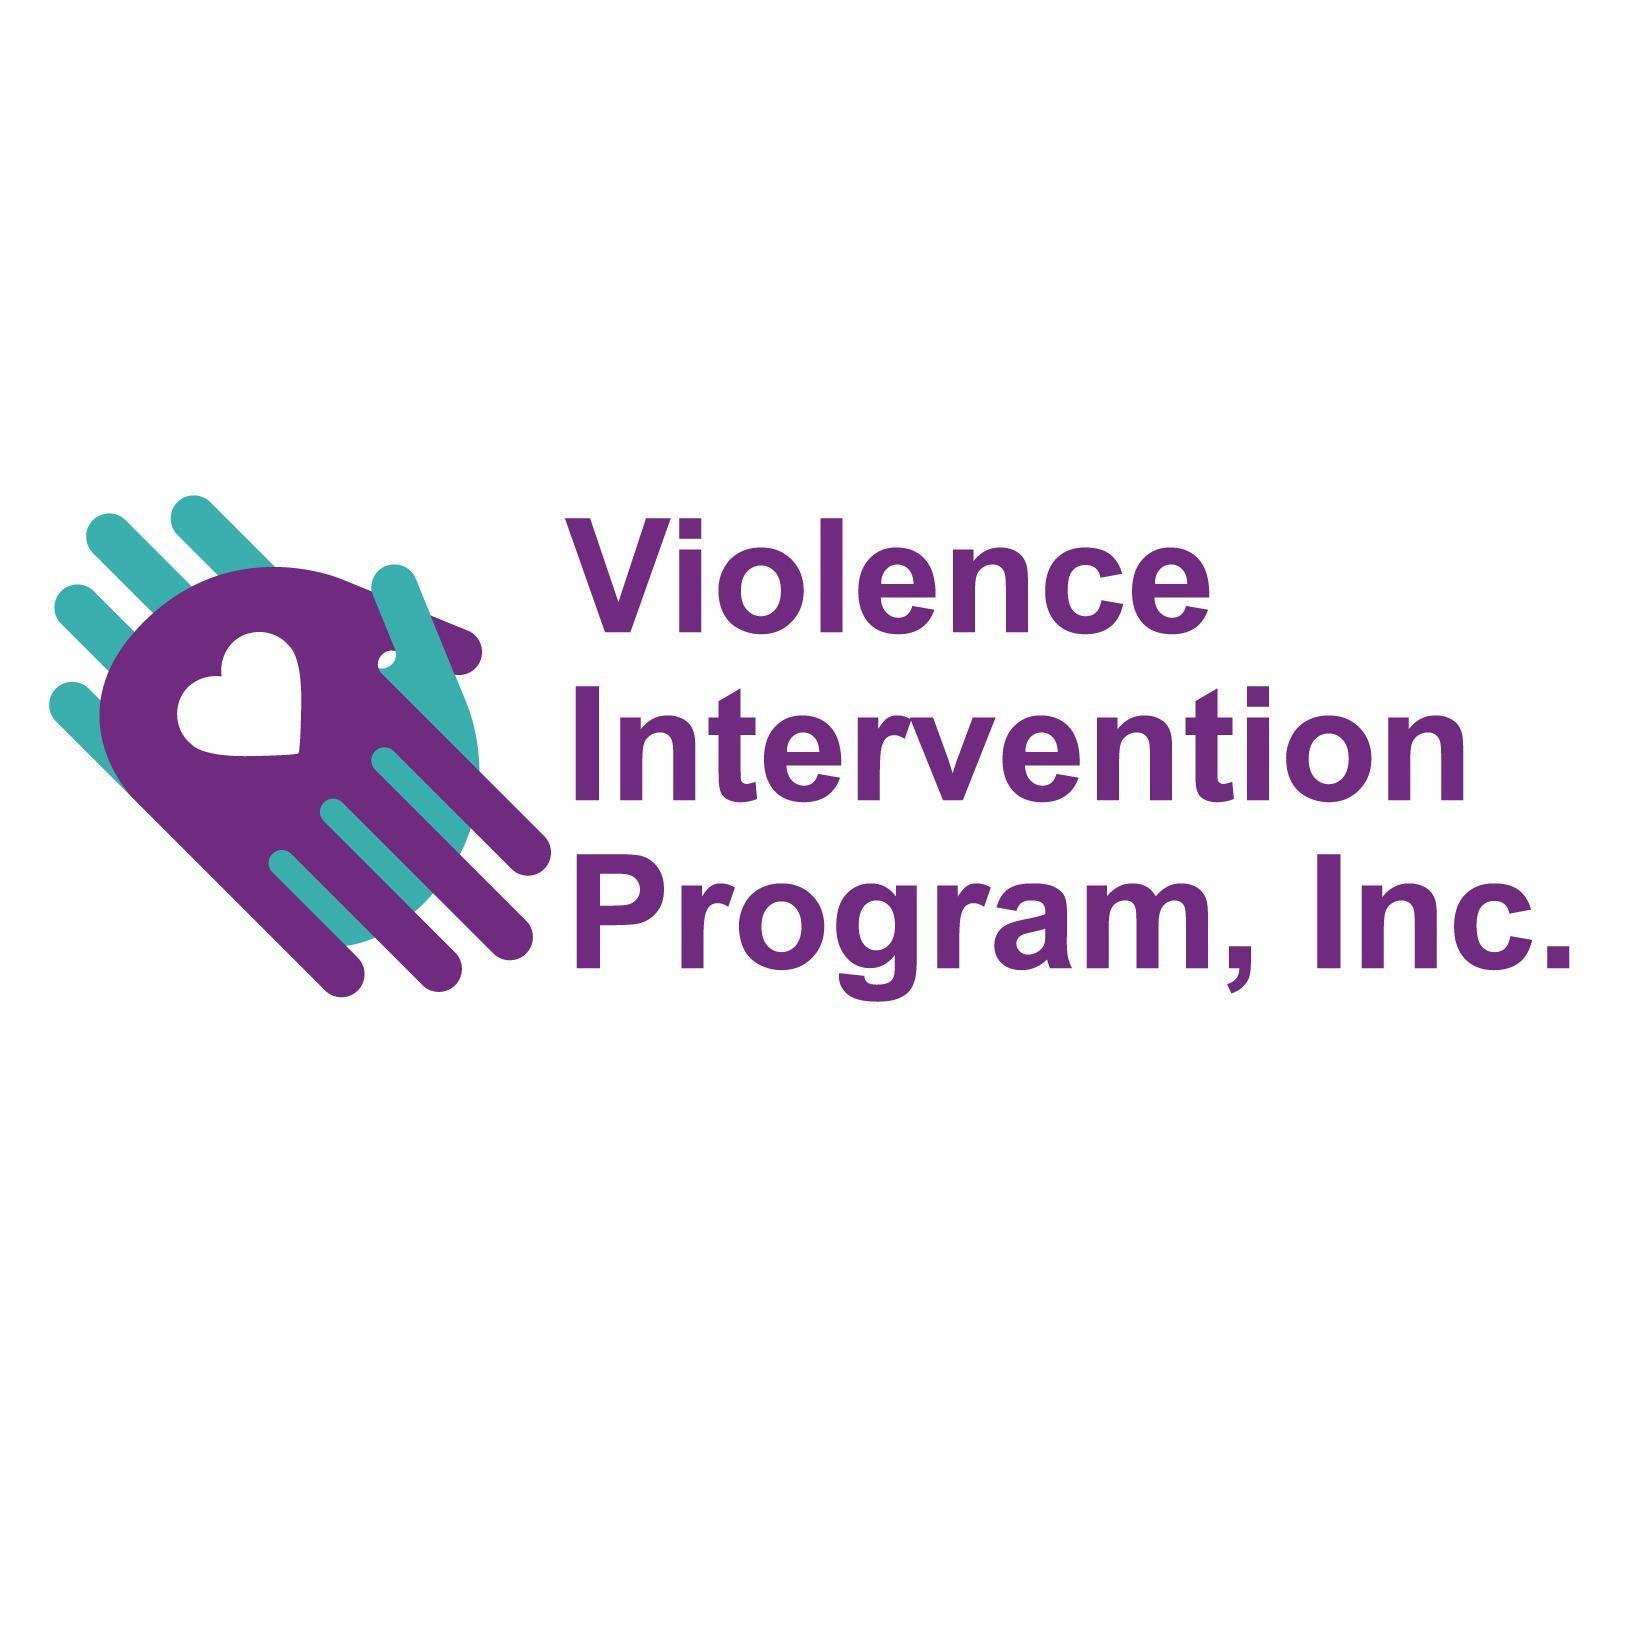 Violence Intervention Program, Inc. (Manhattan)